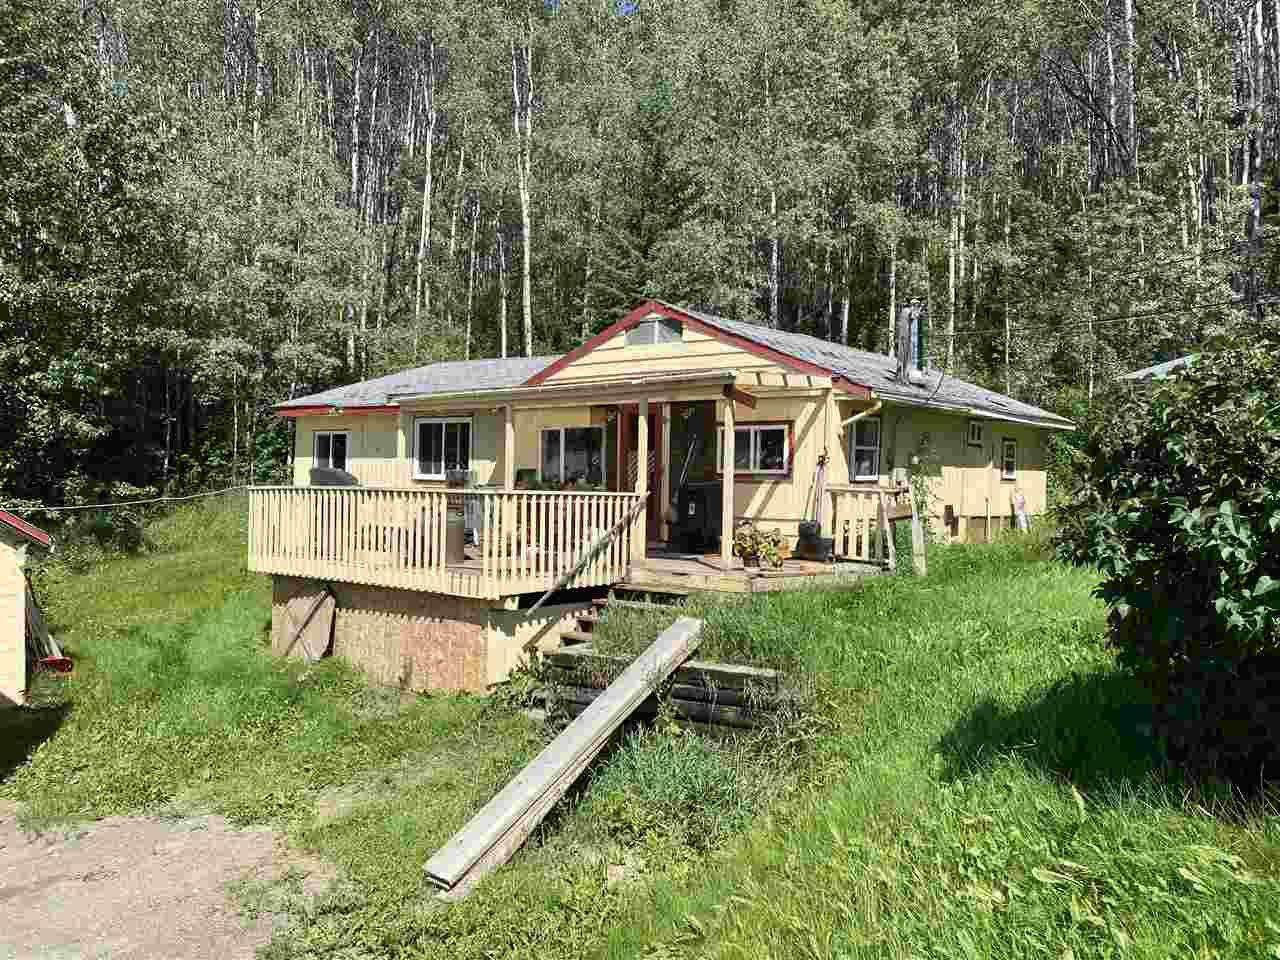 Main Photo: 2100 NASH Road in Burns Lake: Burns Lake - Rural West House for sale (Burns Lake (Zone 55))  : MLS®# R2481912